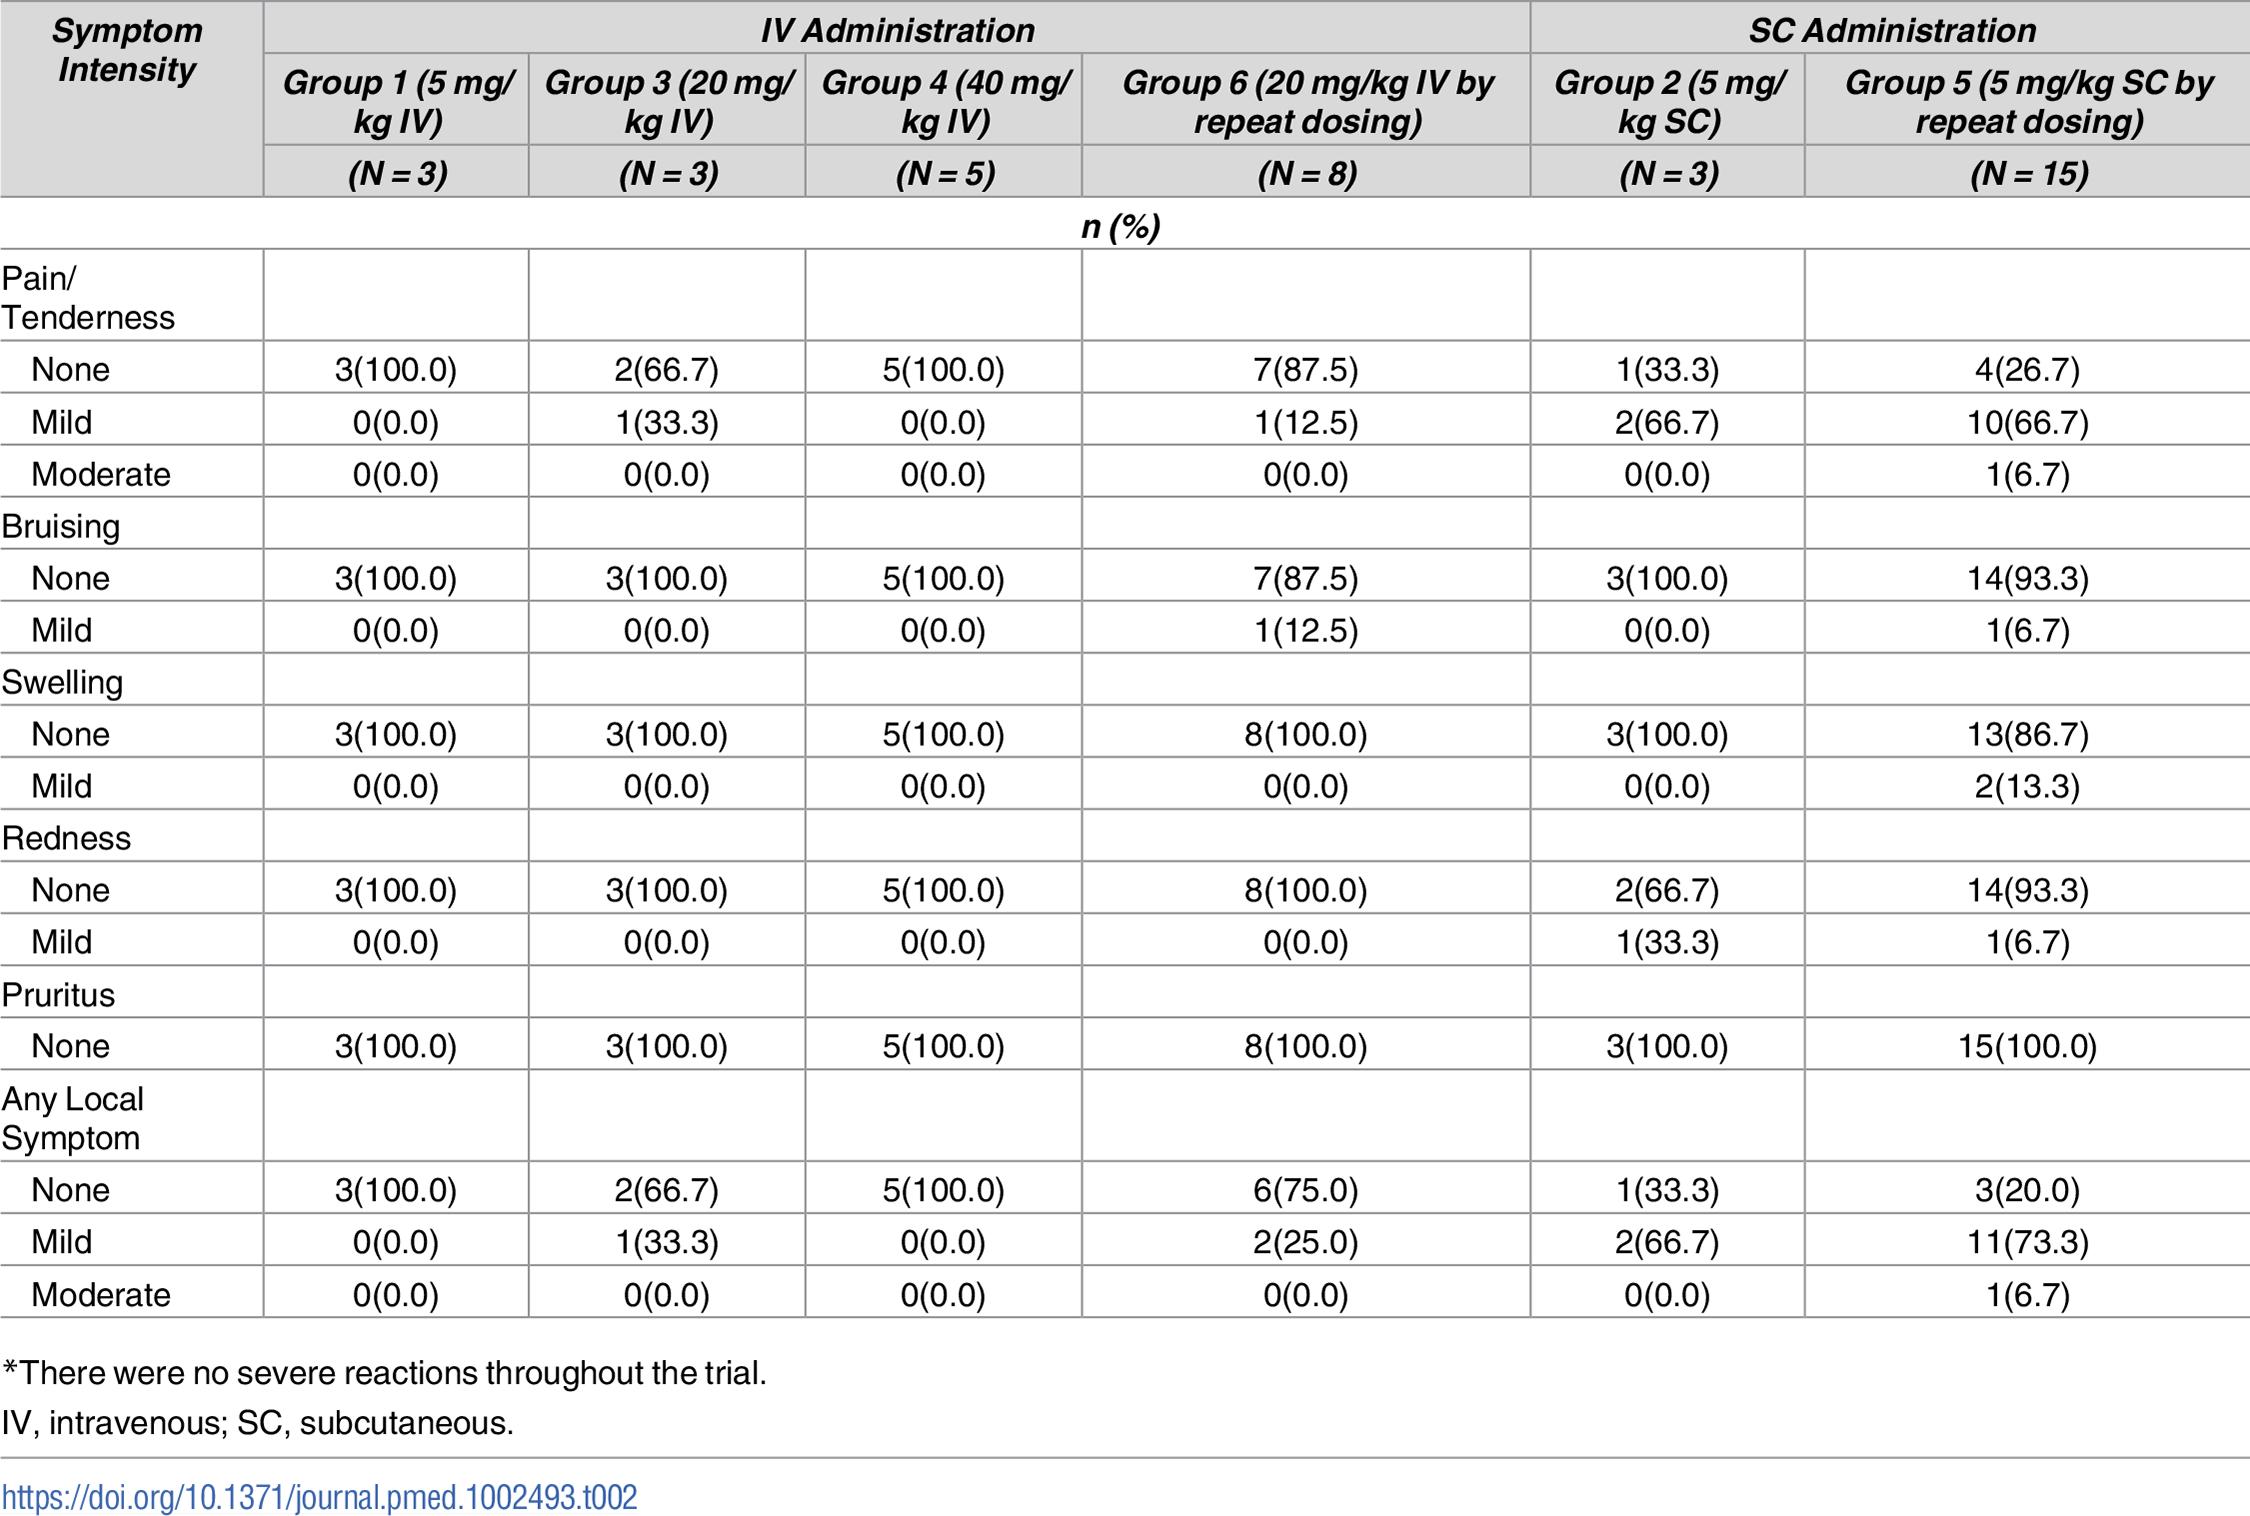 Maximum local reactogenicity up to day 7 after VRC01LS administration<em class=&quot;ref&quot;>*</em>.